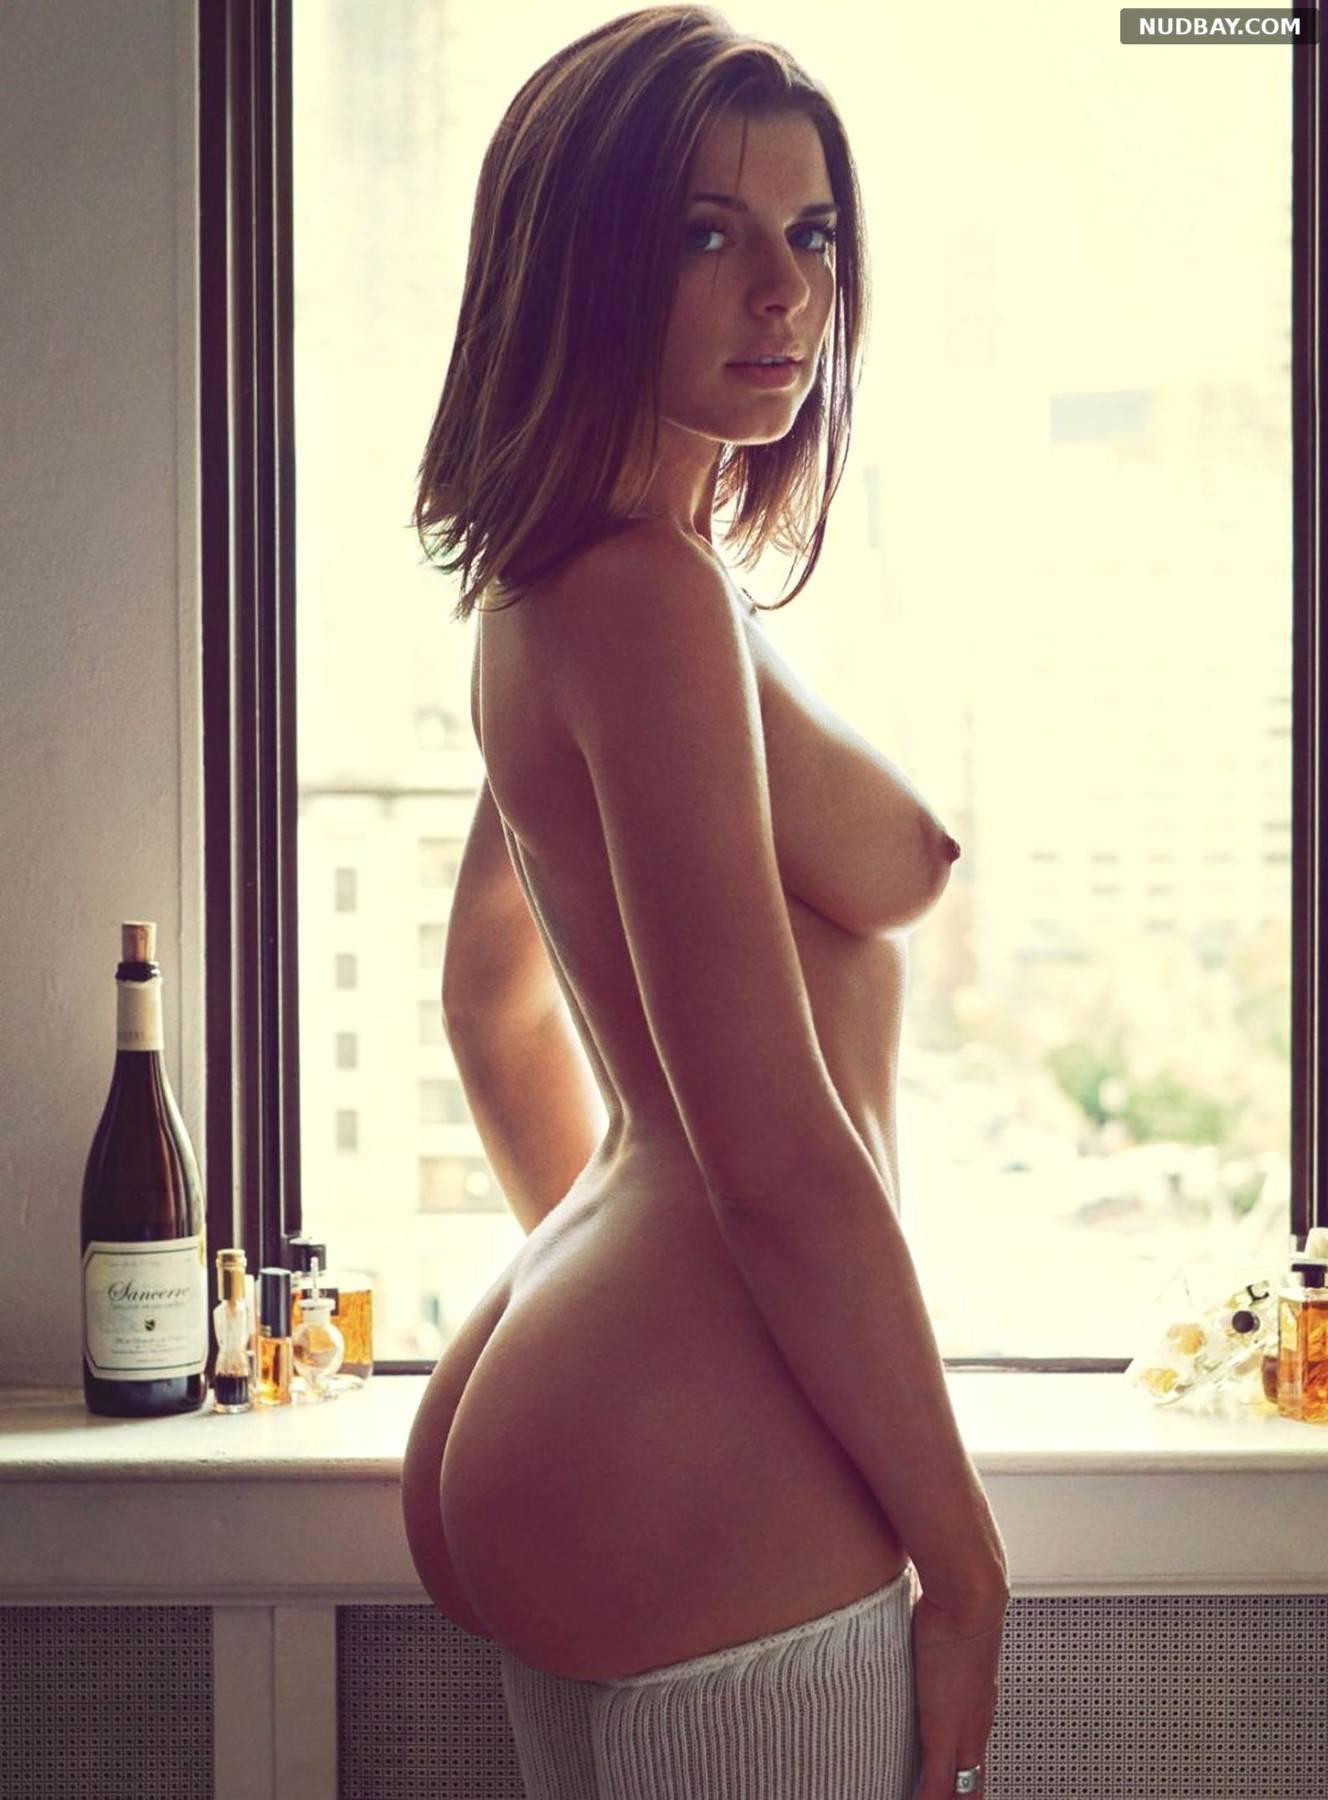 Julia Fox nude photoshoot in Playboy